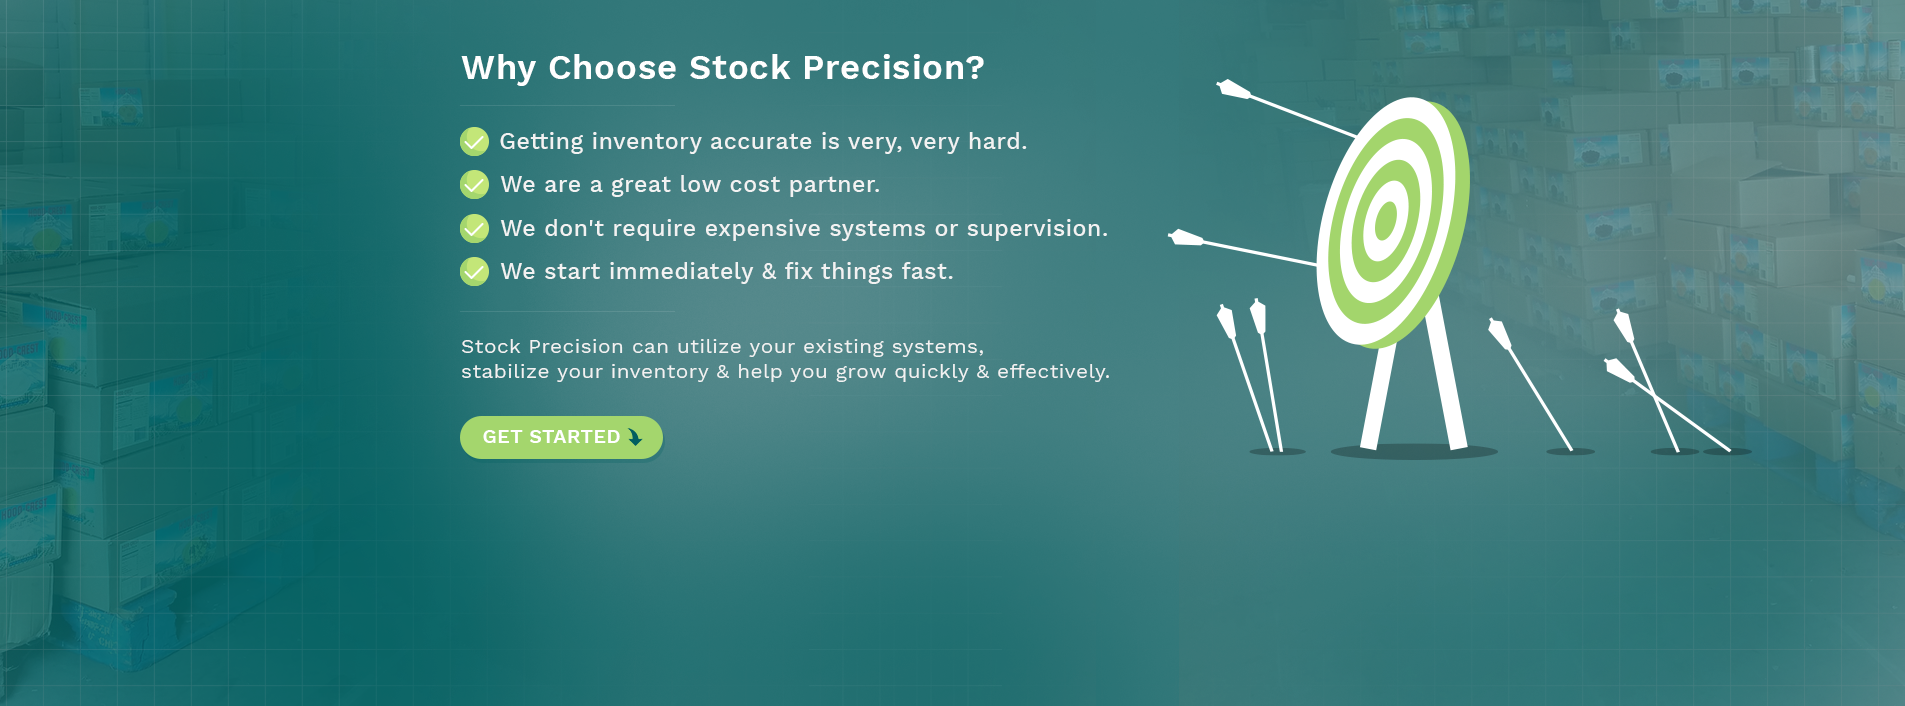 stock-precision-slide-4-v2.png